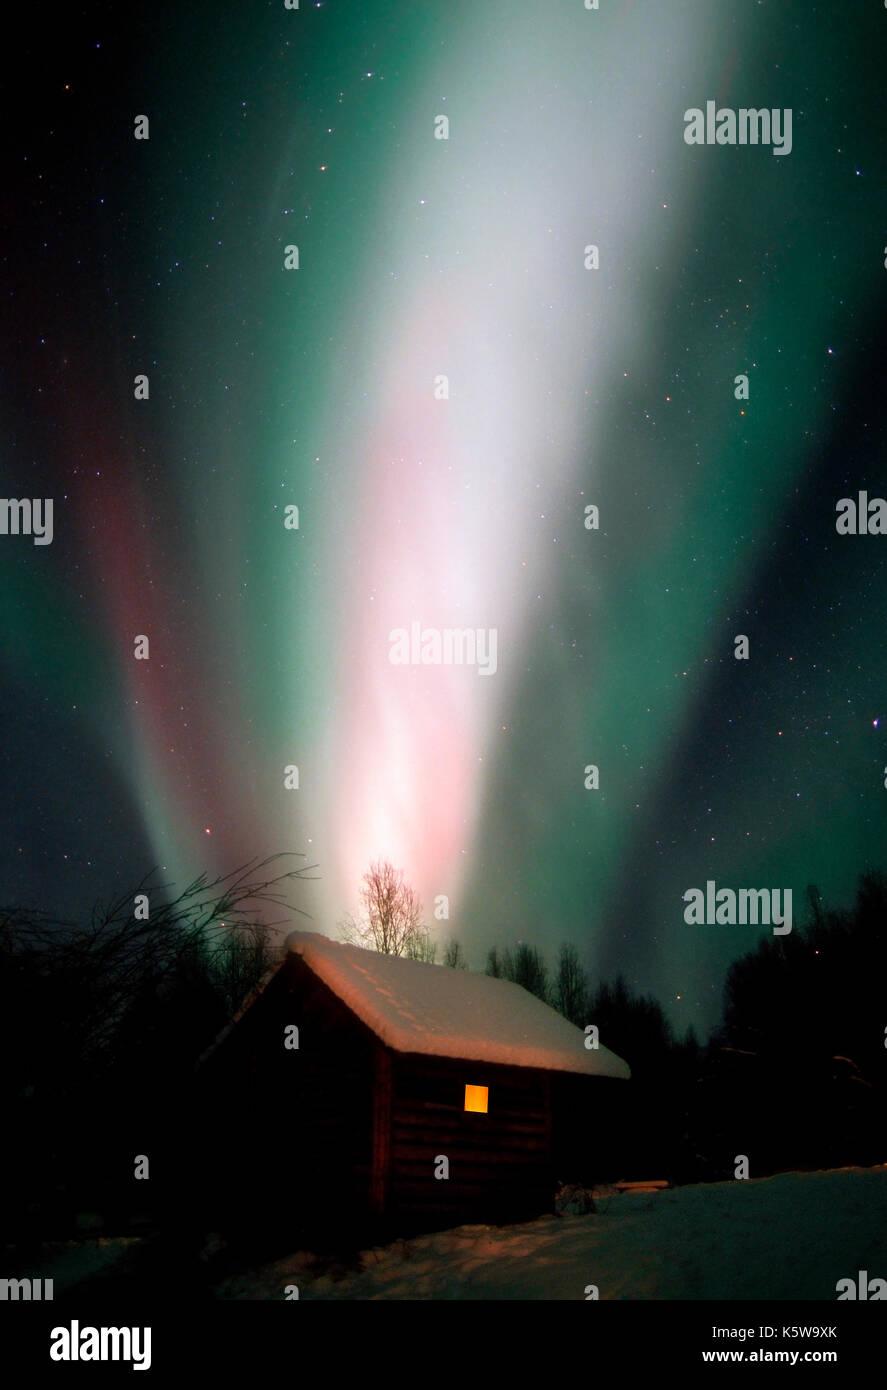 Aurora Borealis; Northern Lights; Celestial; Sky; Natural Phenomena; Alaska; Winter - Stock Image